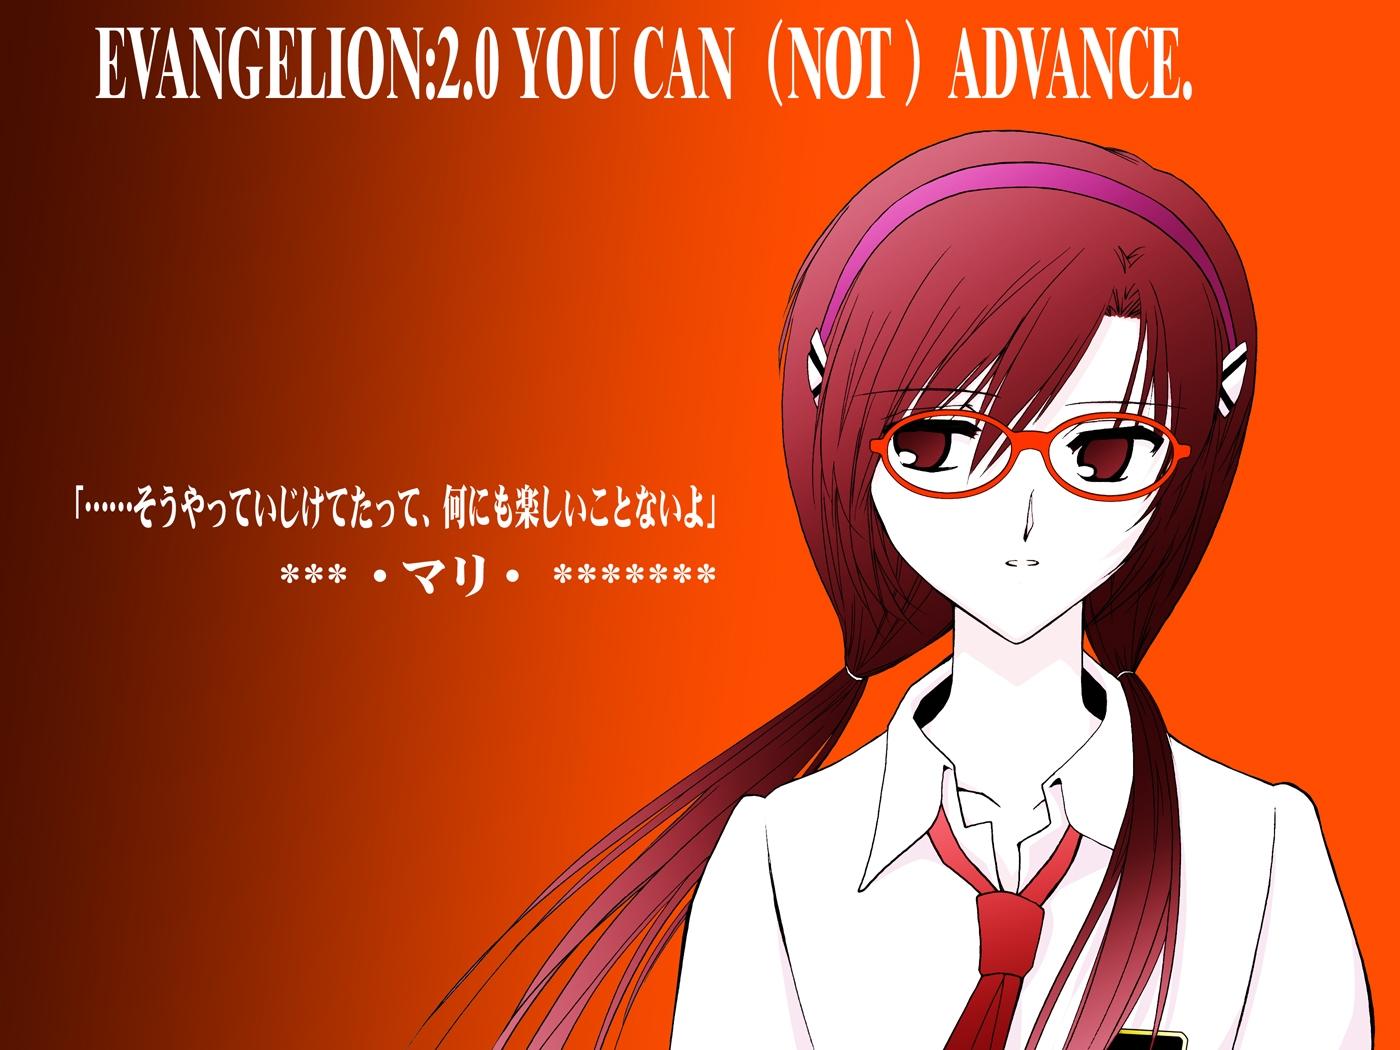 Neon Genesis Evangelion 20 You Can Makinami Mari Illustrious